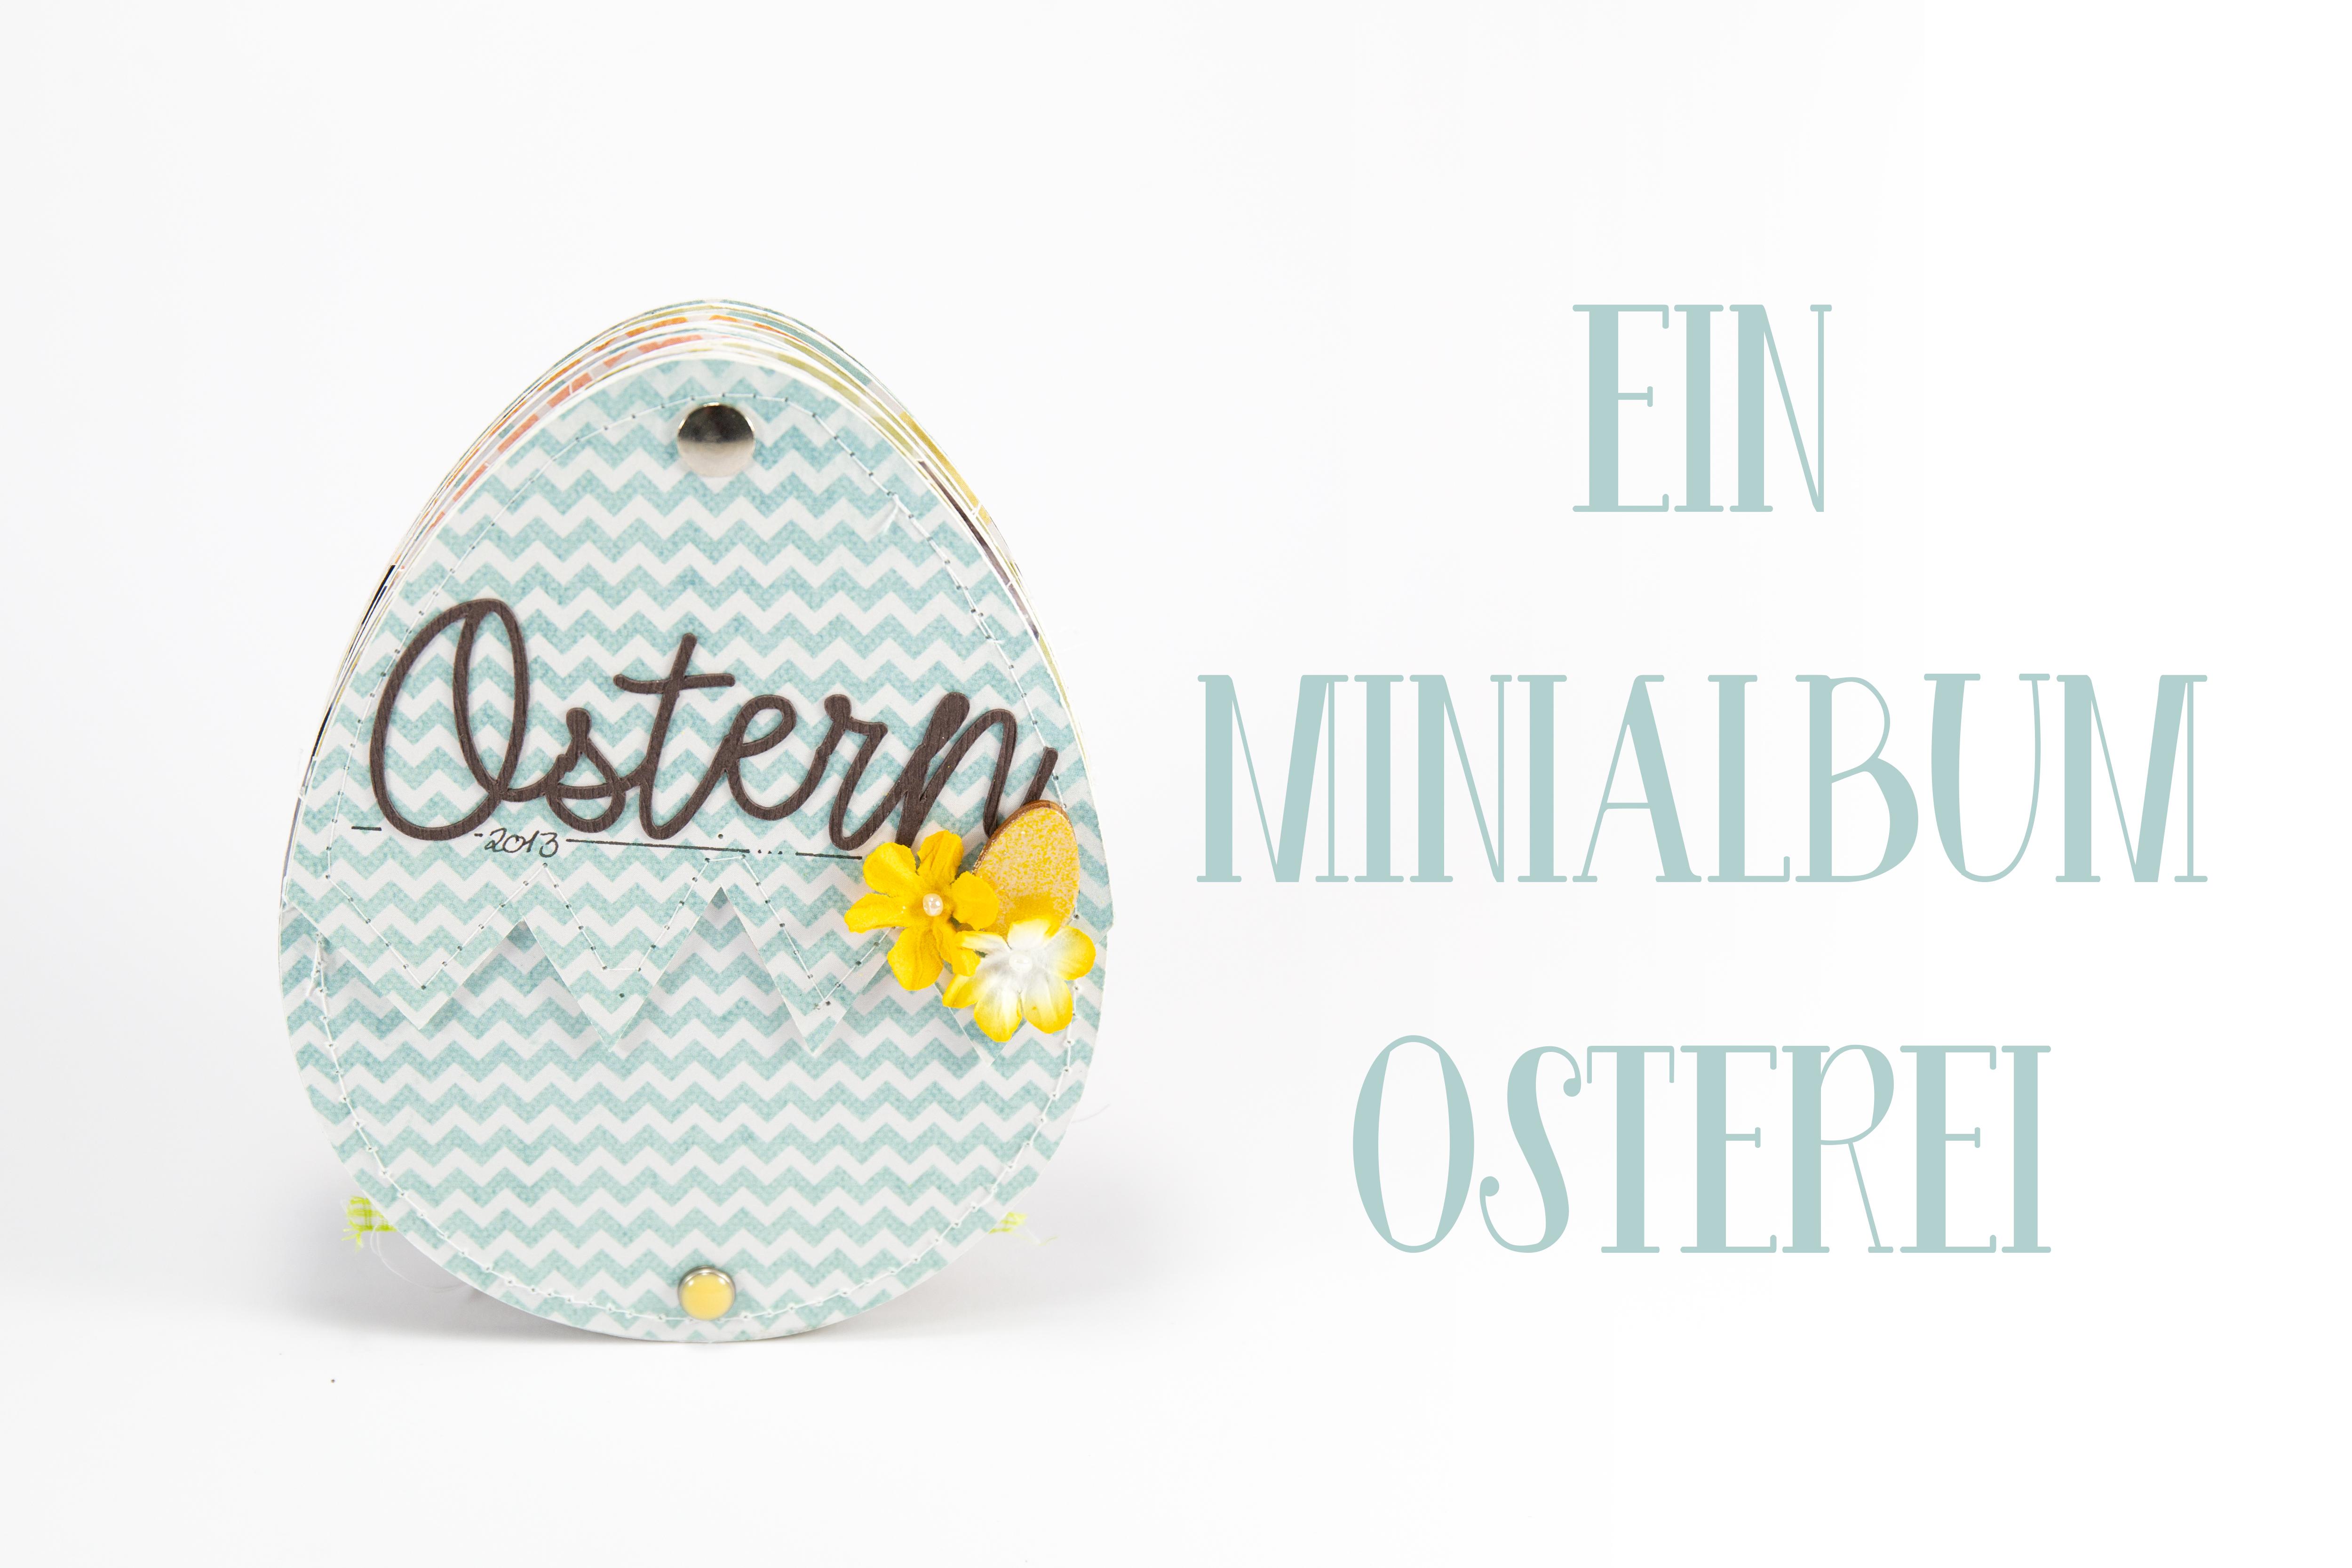 Minialbum Ostern